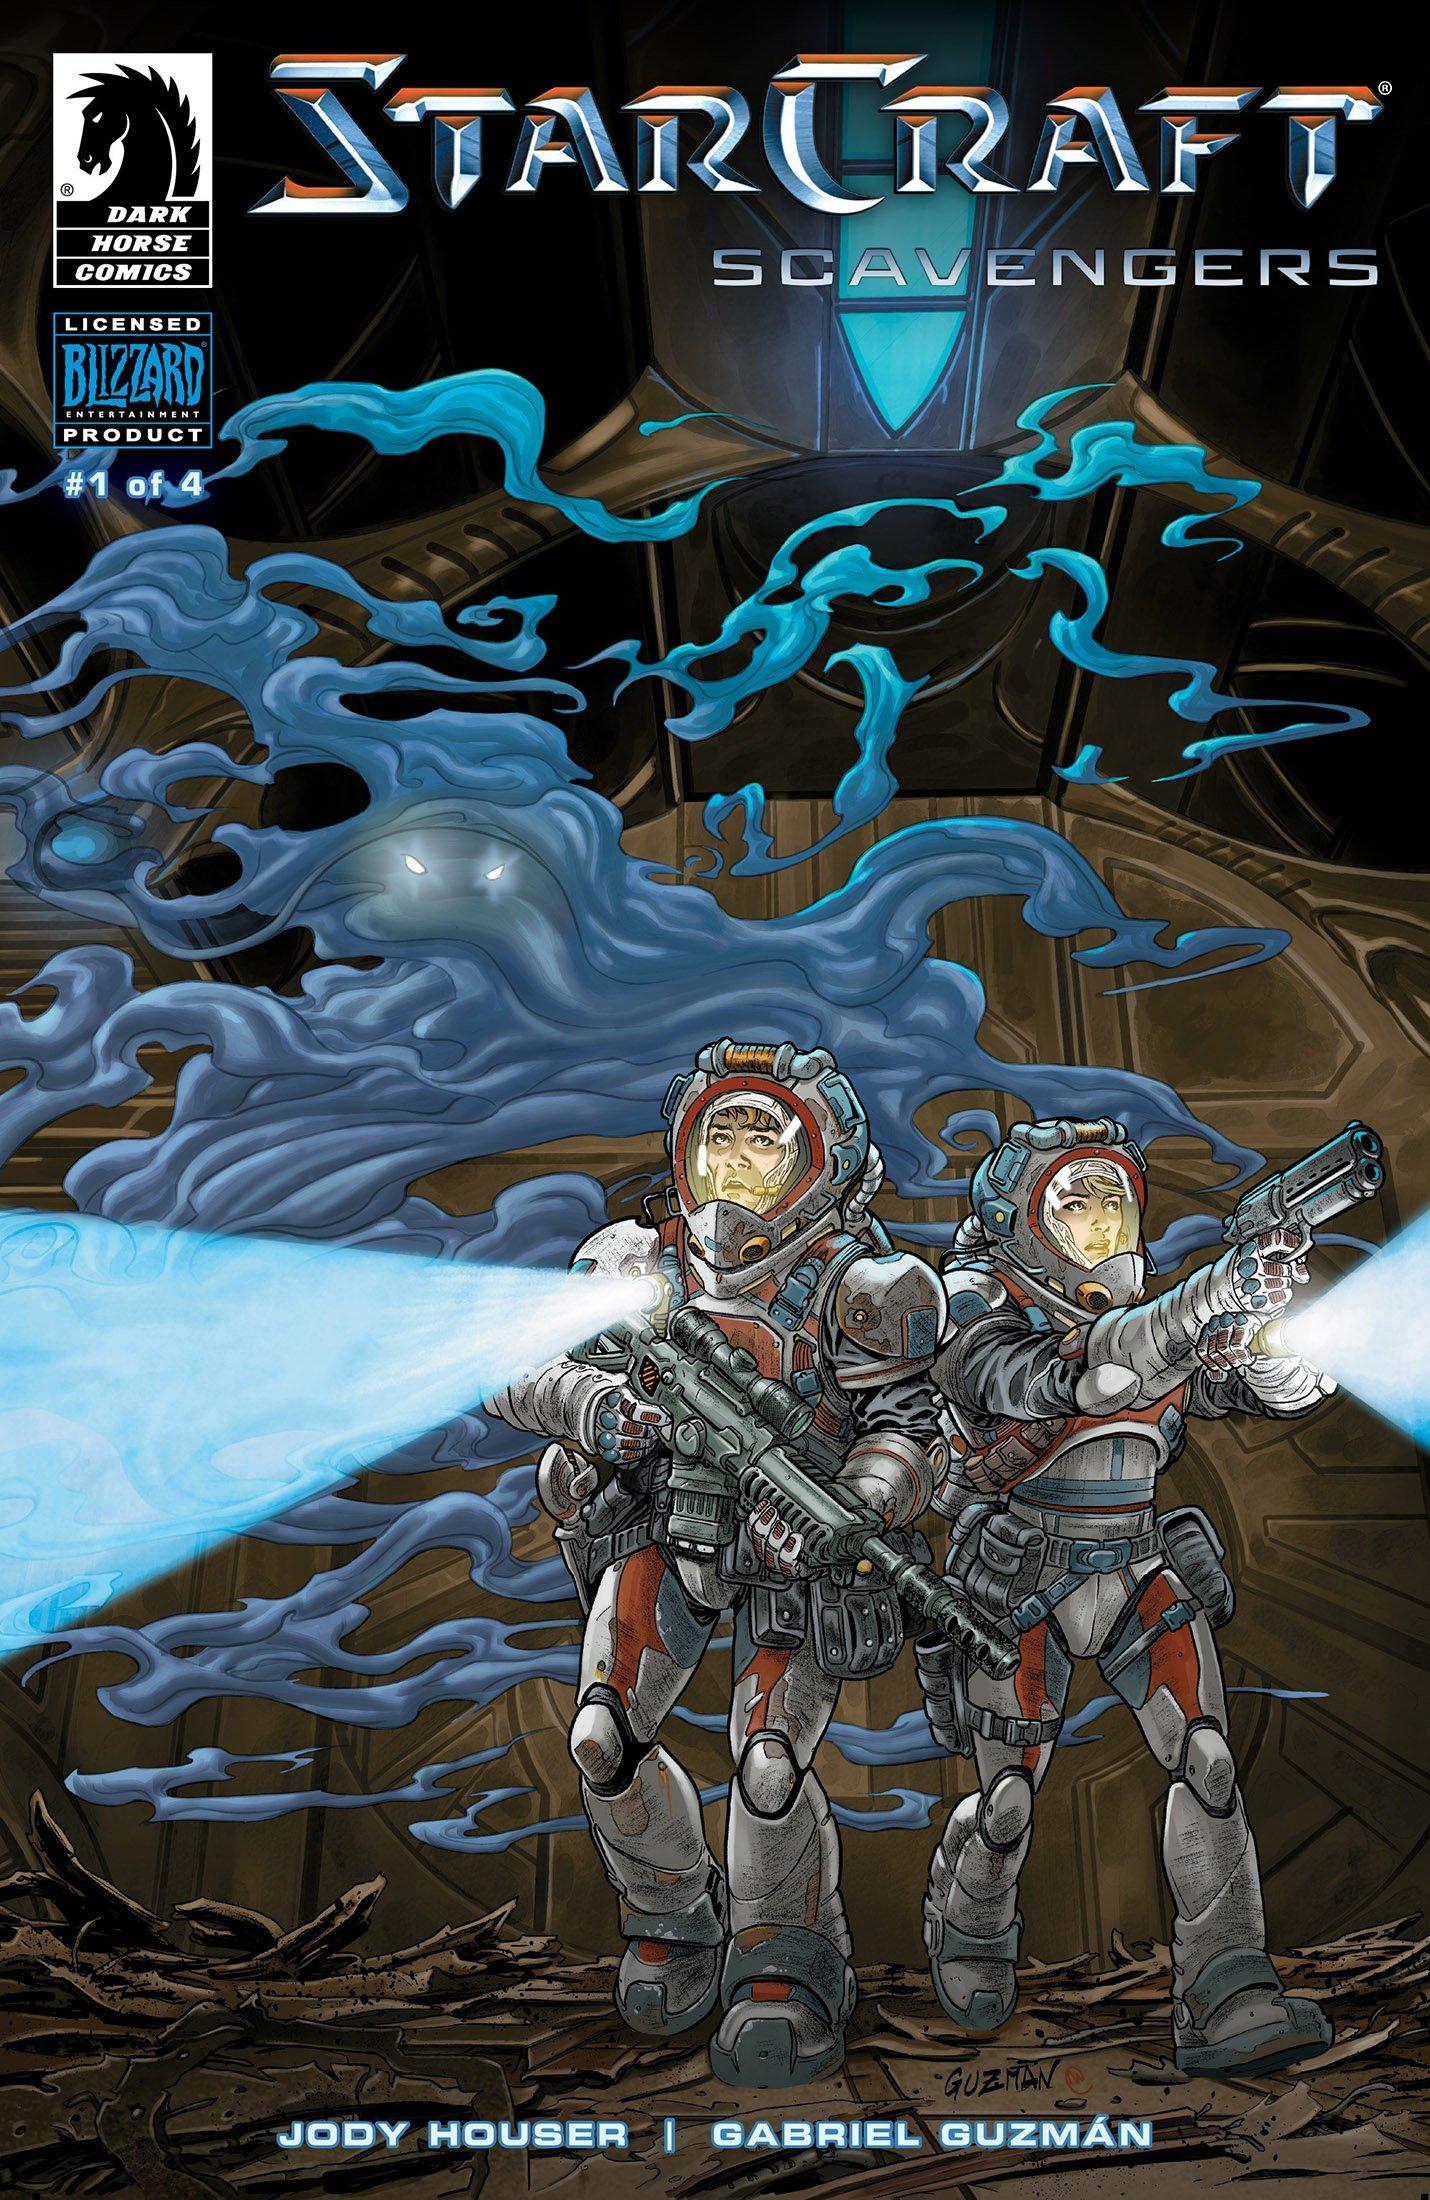 StarCraft - Scavengers 001 (July 2018)